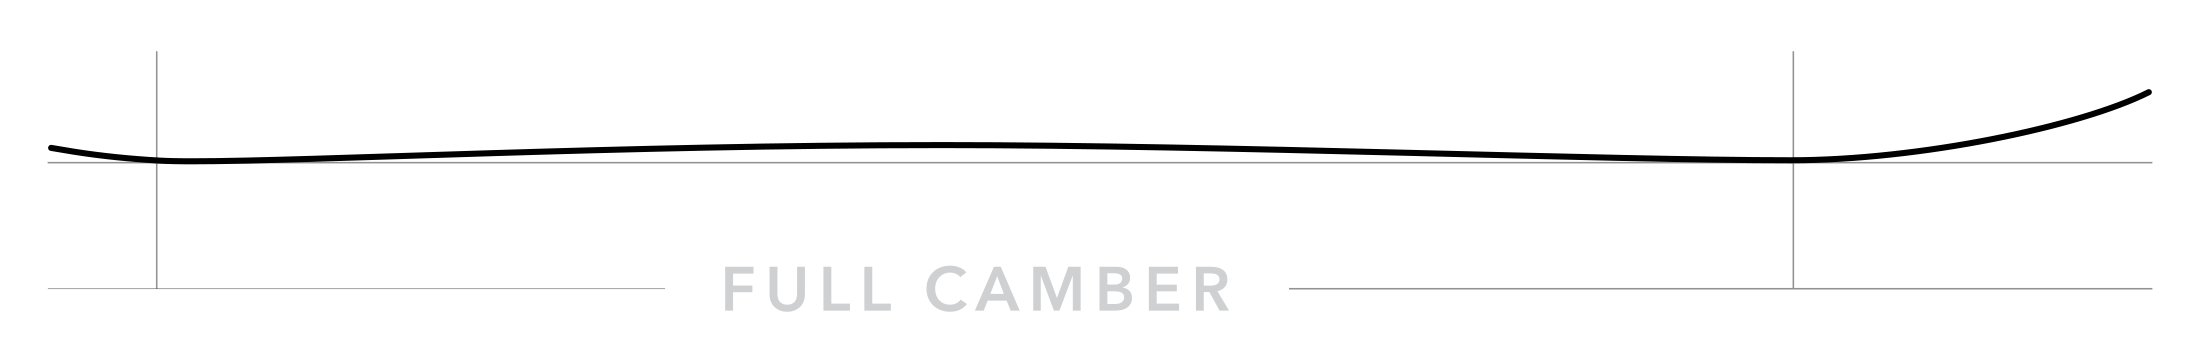 KORUA-Shapes_BoardProfile-Drawing_Web_2200px-150dpi_FullCamber